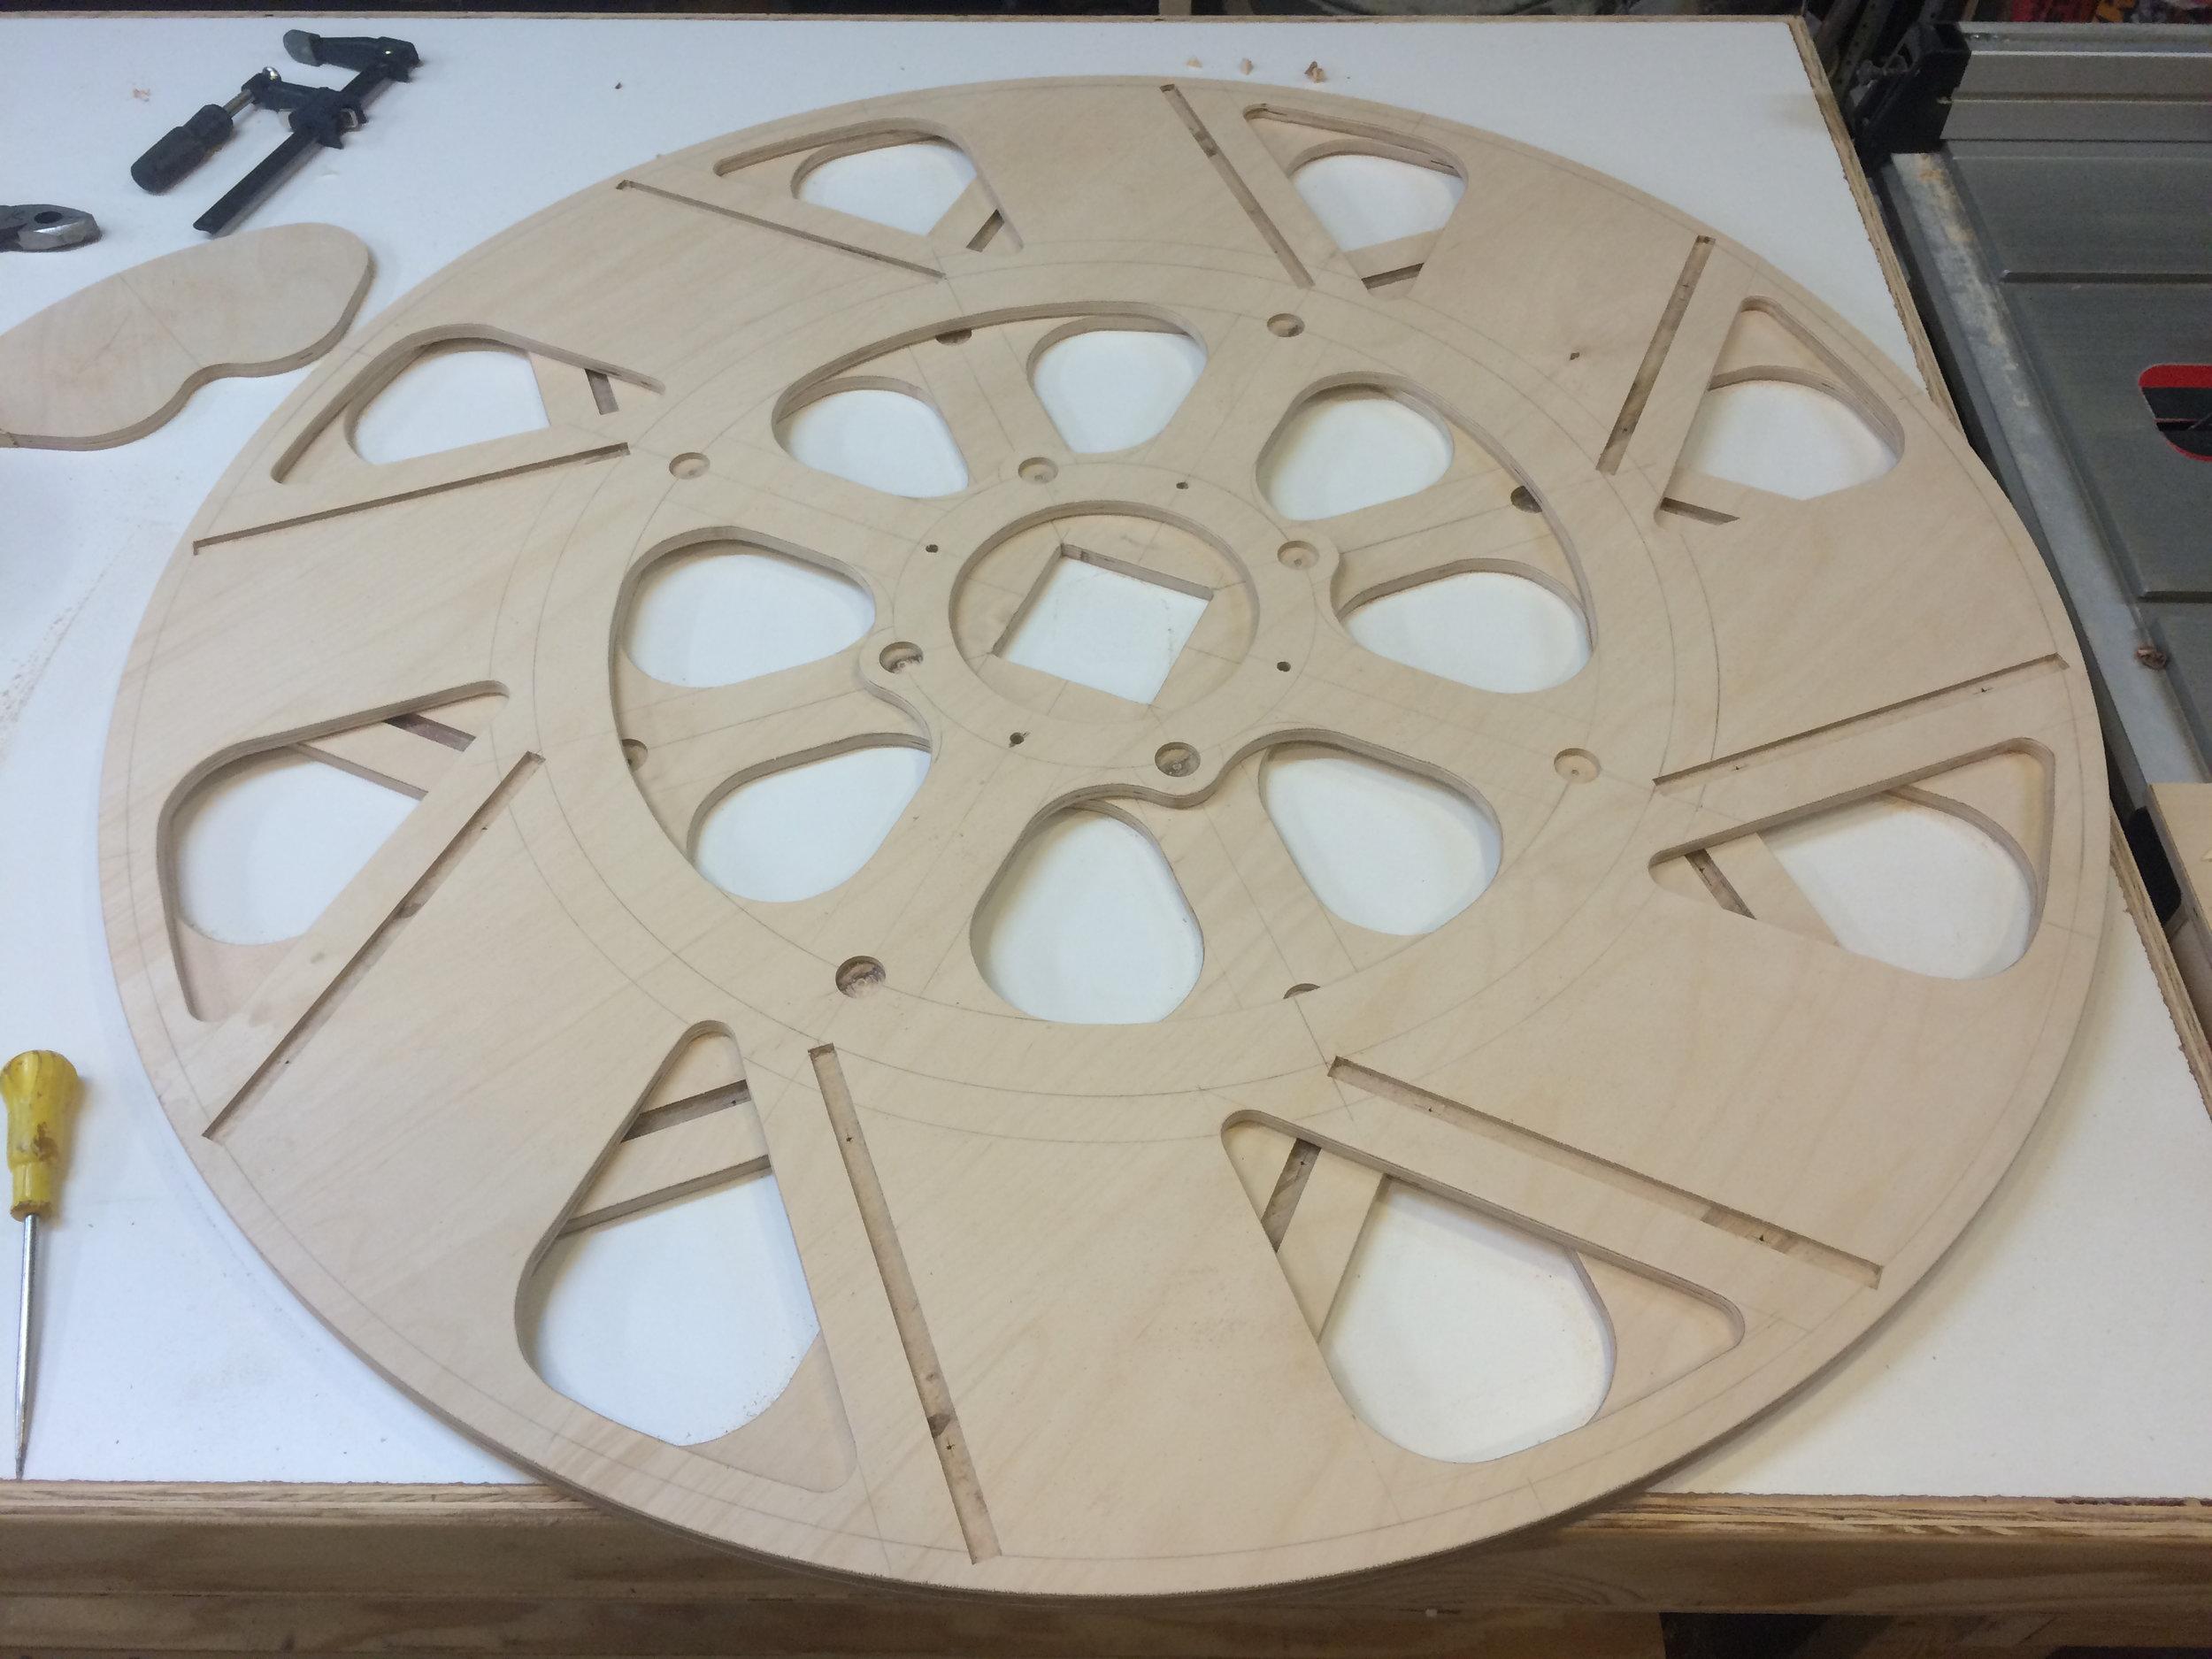 cutting spillways for the water which lighten the wheel